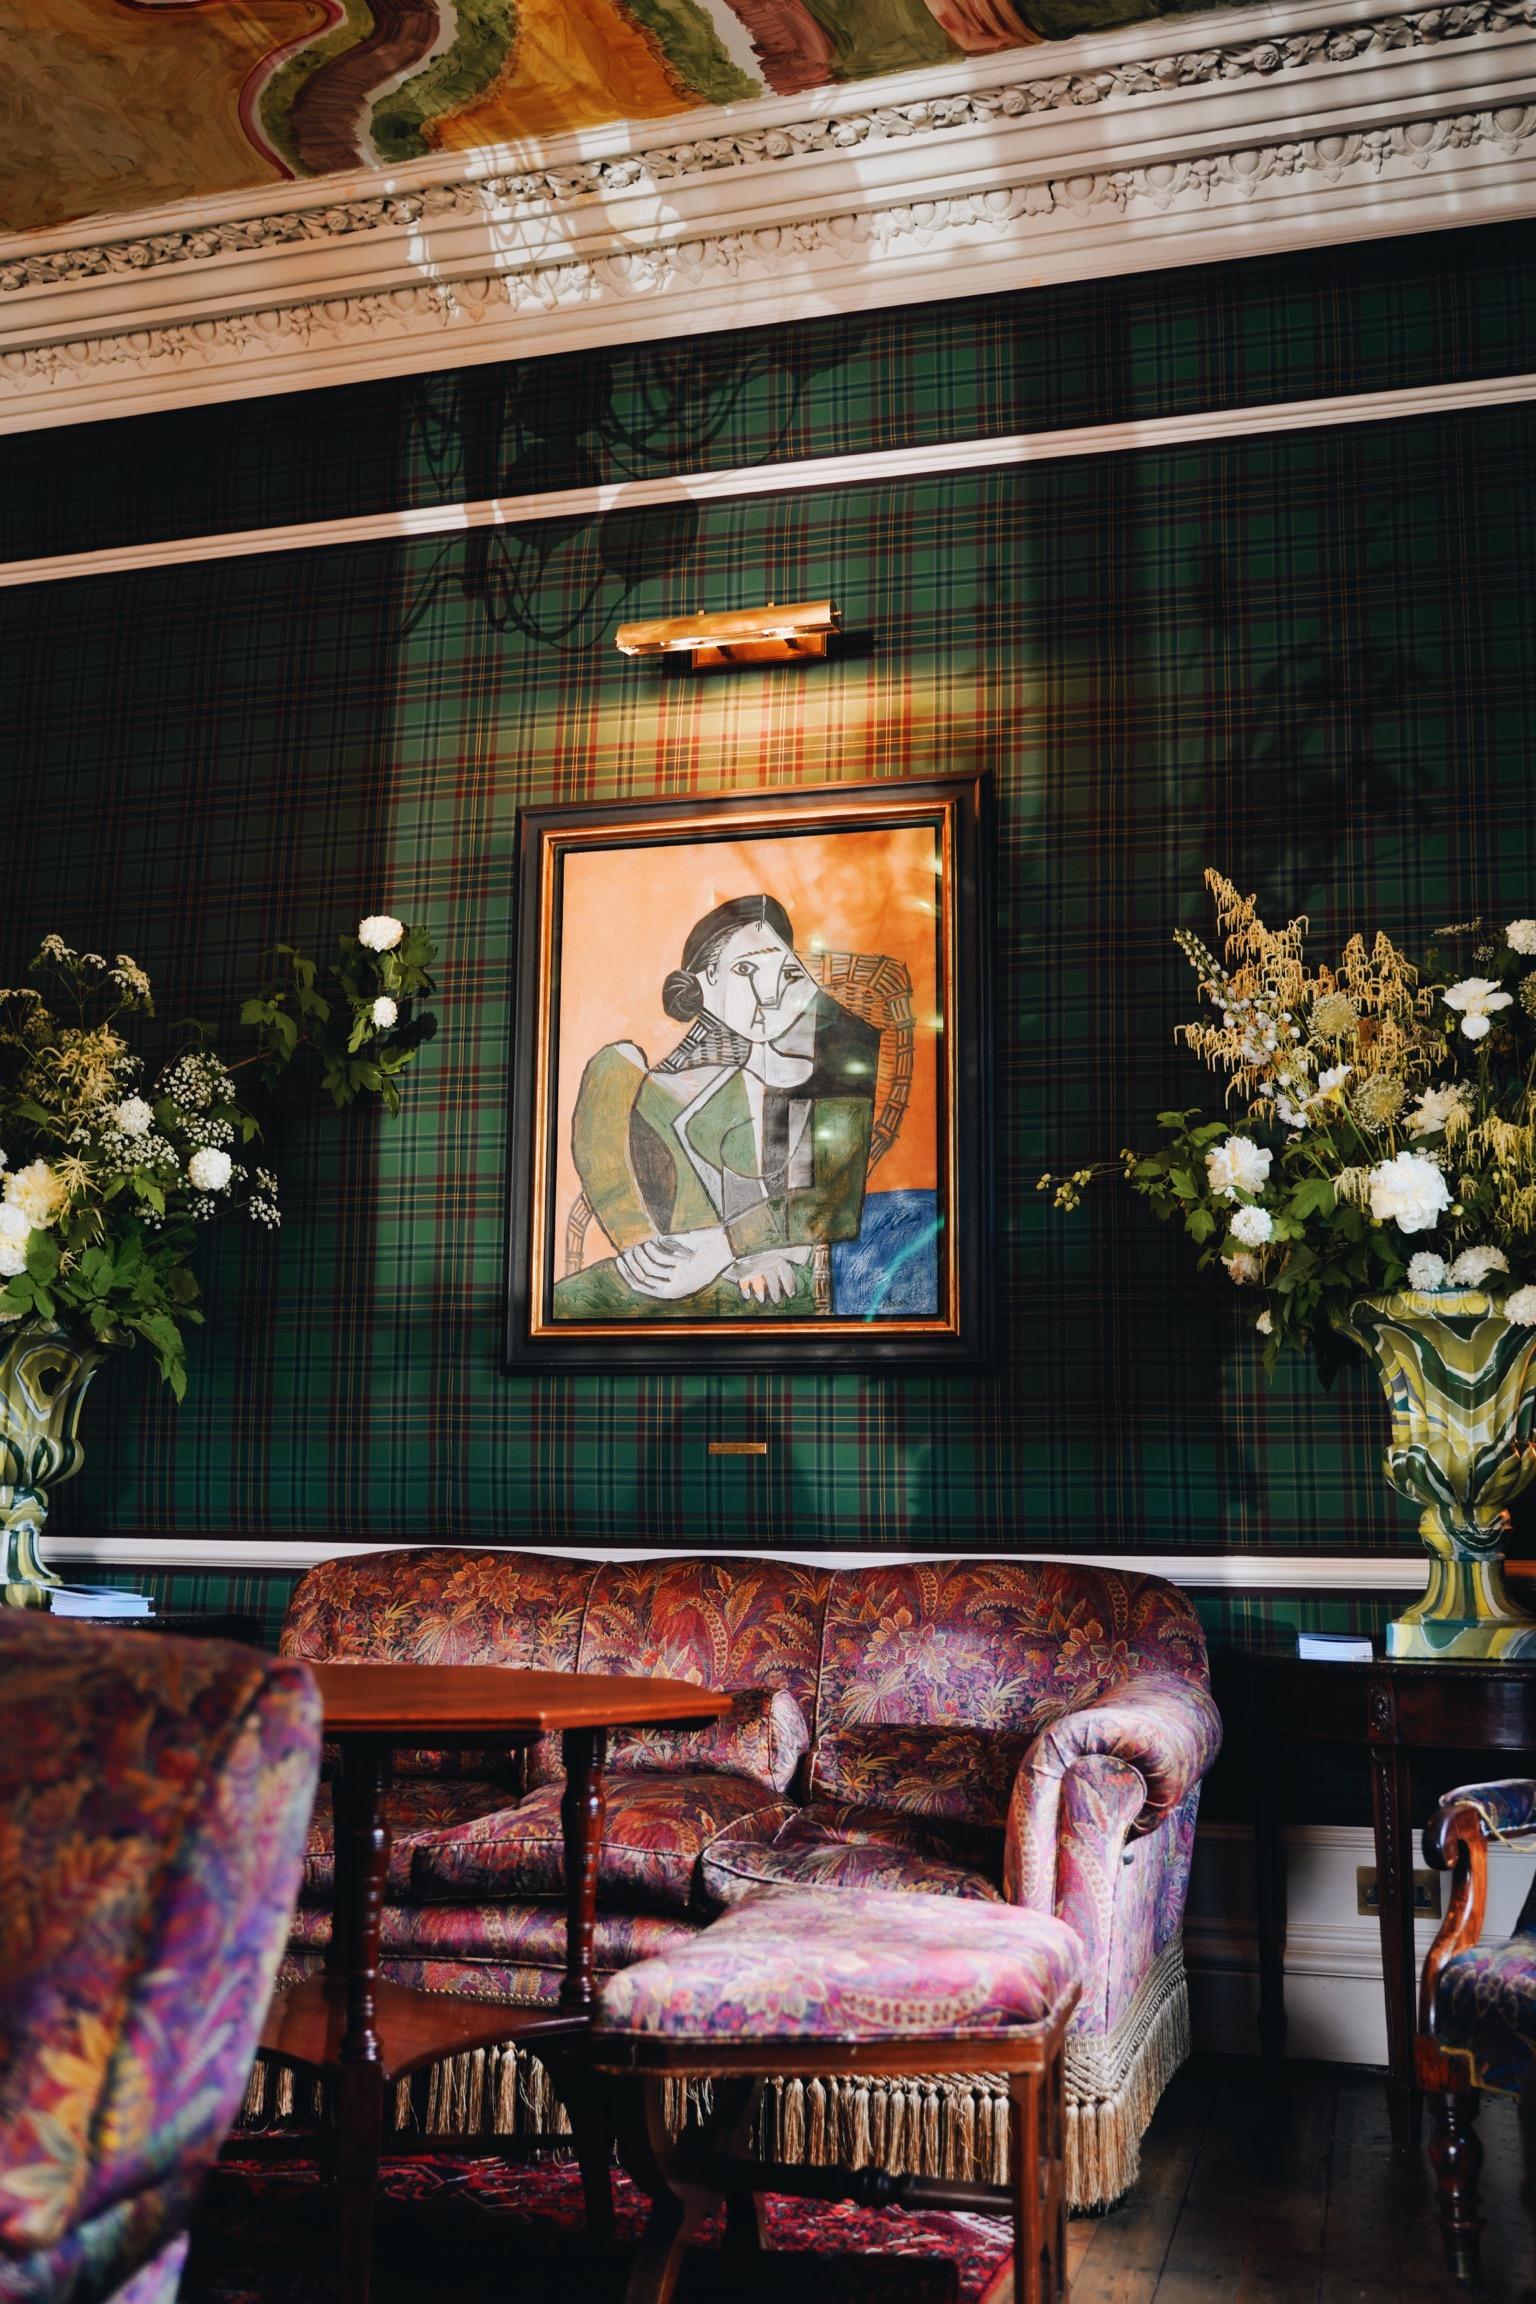 Fife Arms Hotel in Scozia, Braemar, Aberdeenshire (1)